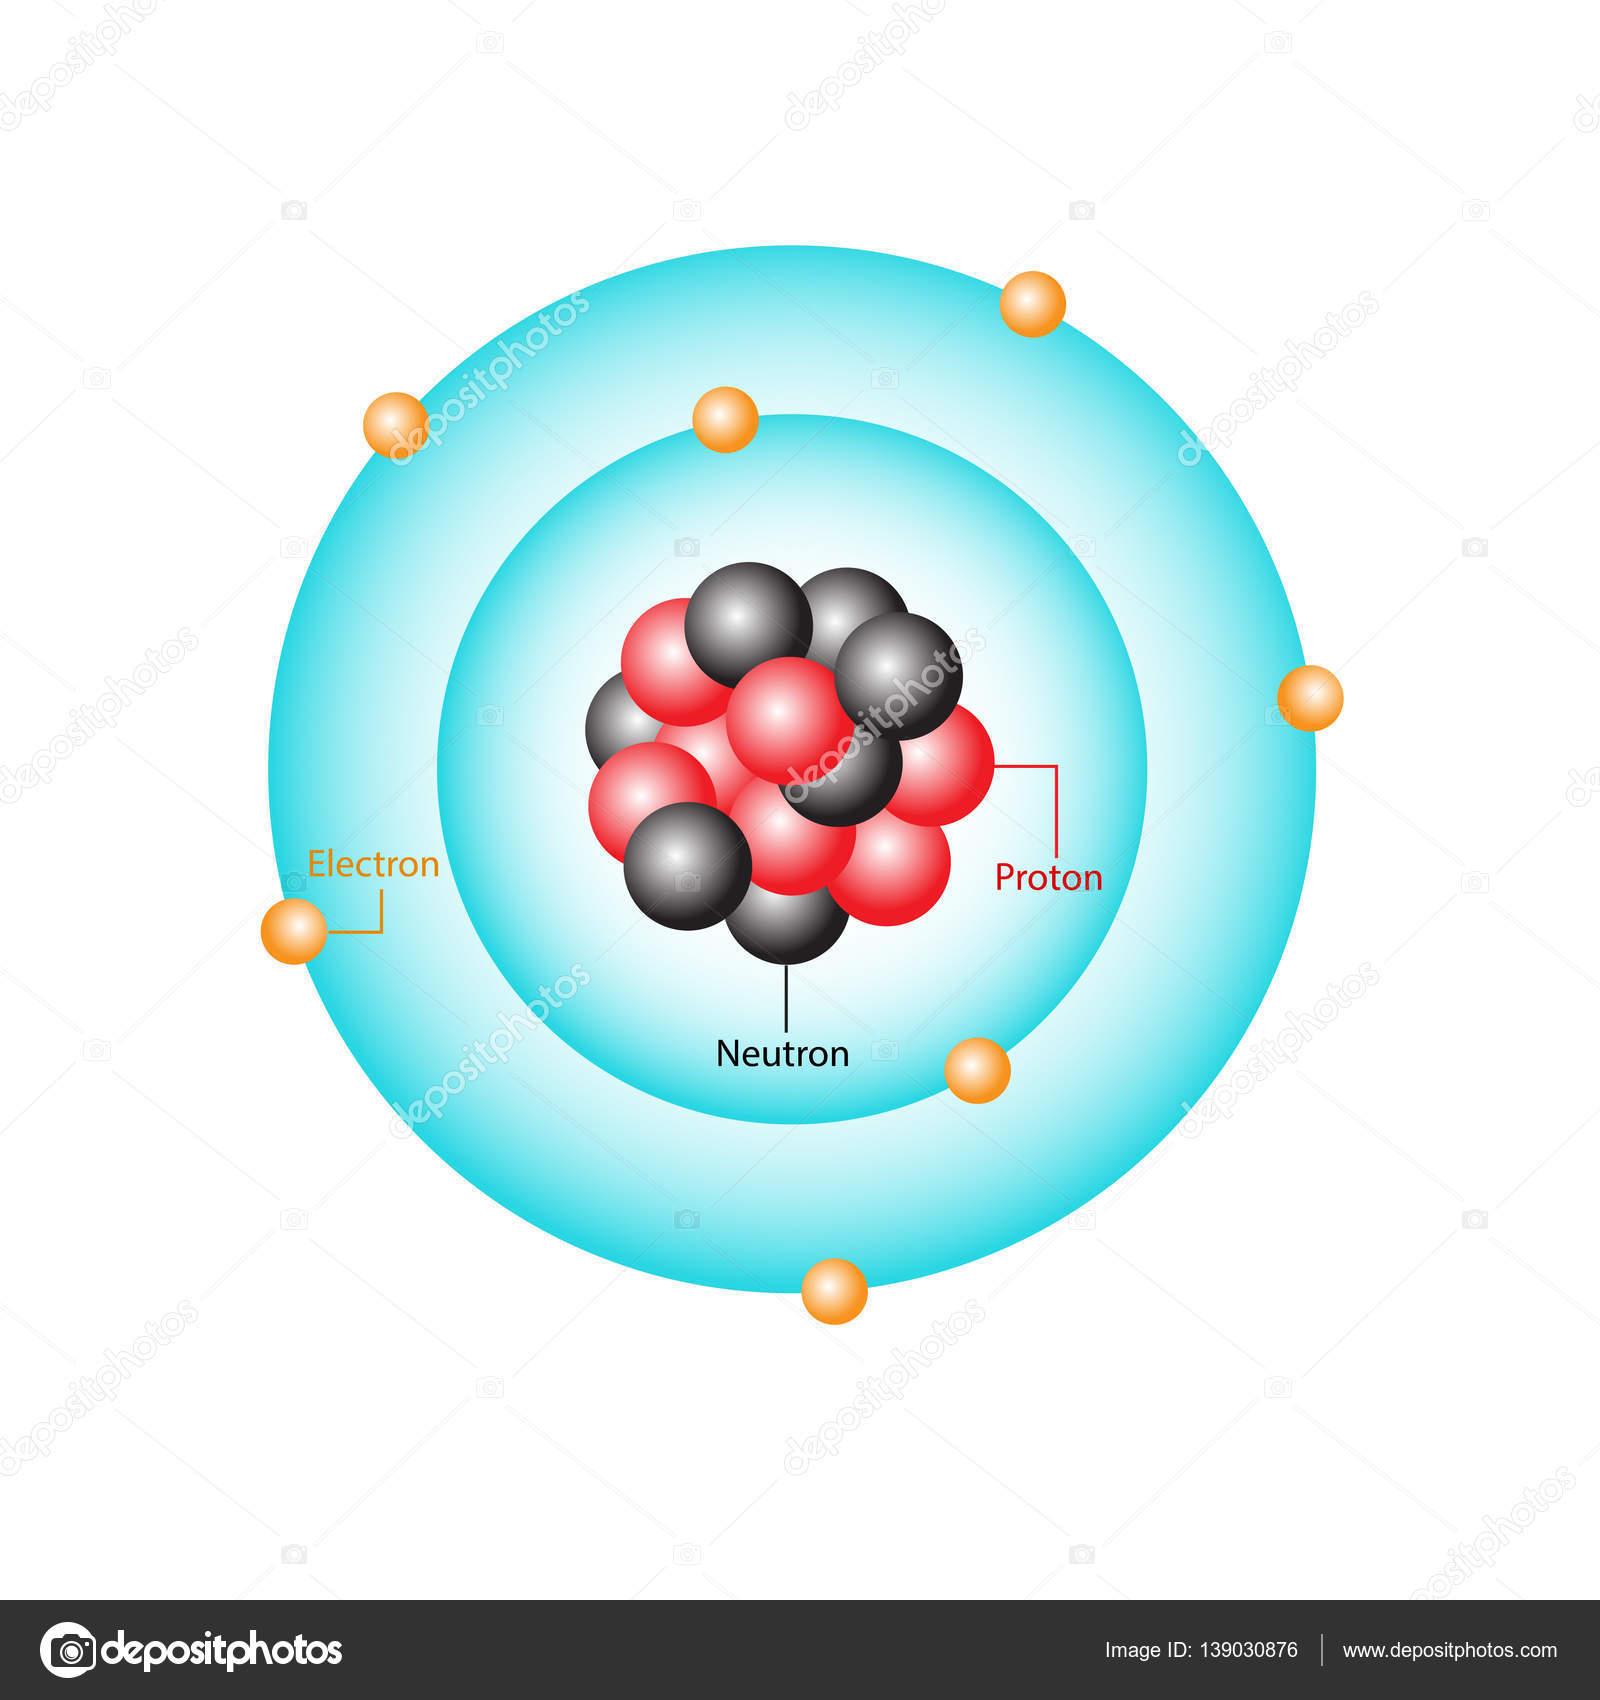 Bohr atomic model stock vector 7gengrafik 139030876 bohr atomic model of nitrogen atom vector by 7gengrafik pooptronica Gallery